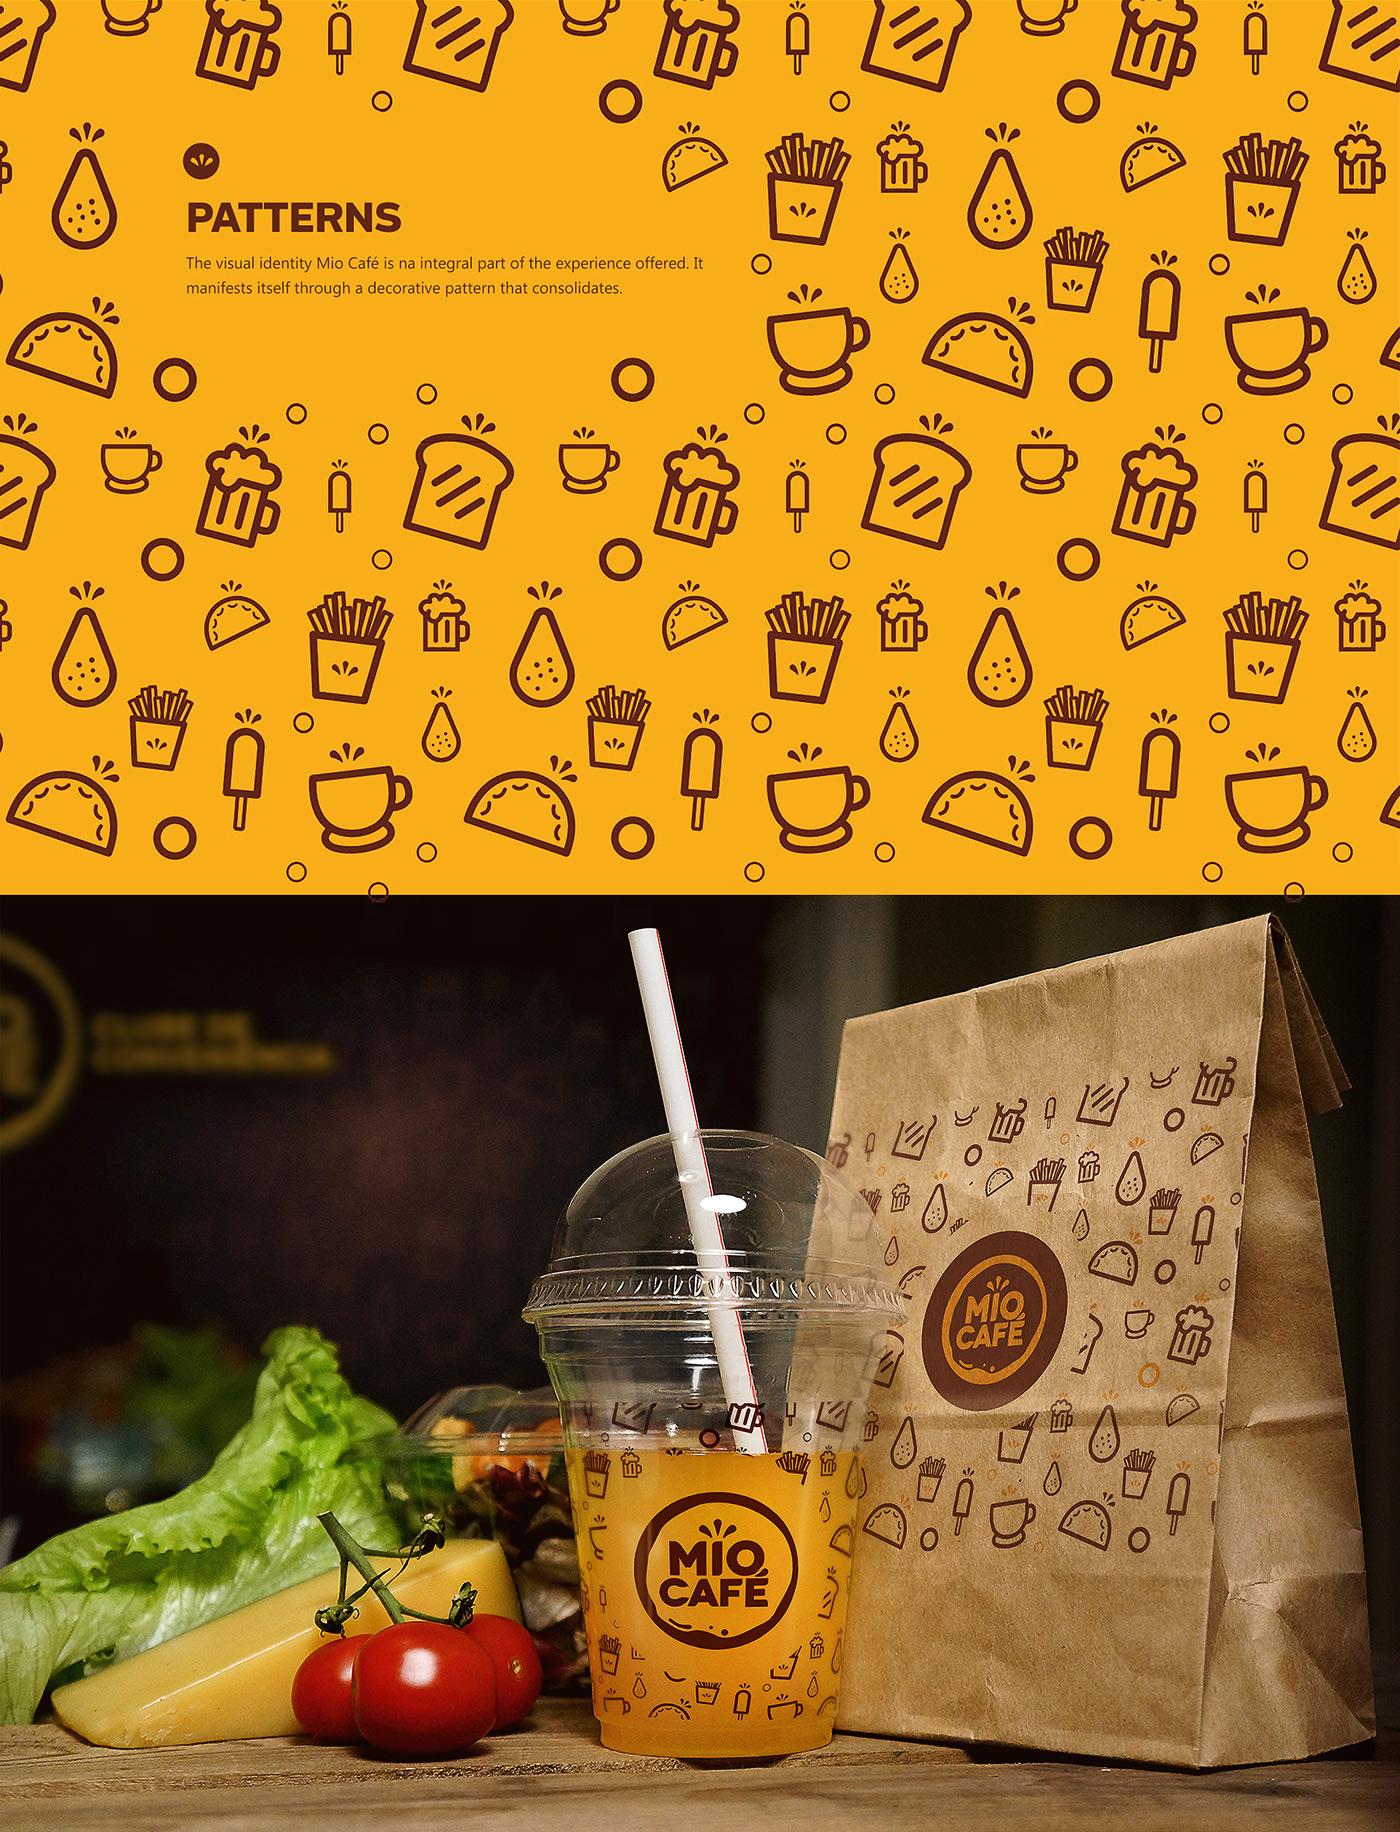 identidade visual Convenience Club Convenience Store Clube de Conveniência Coffee cafe amarelo naming Patterns